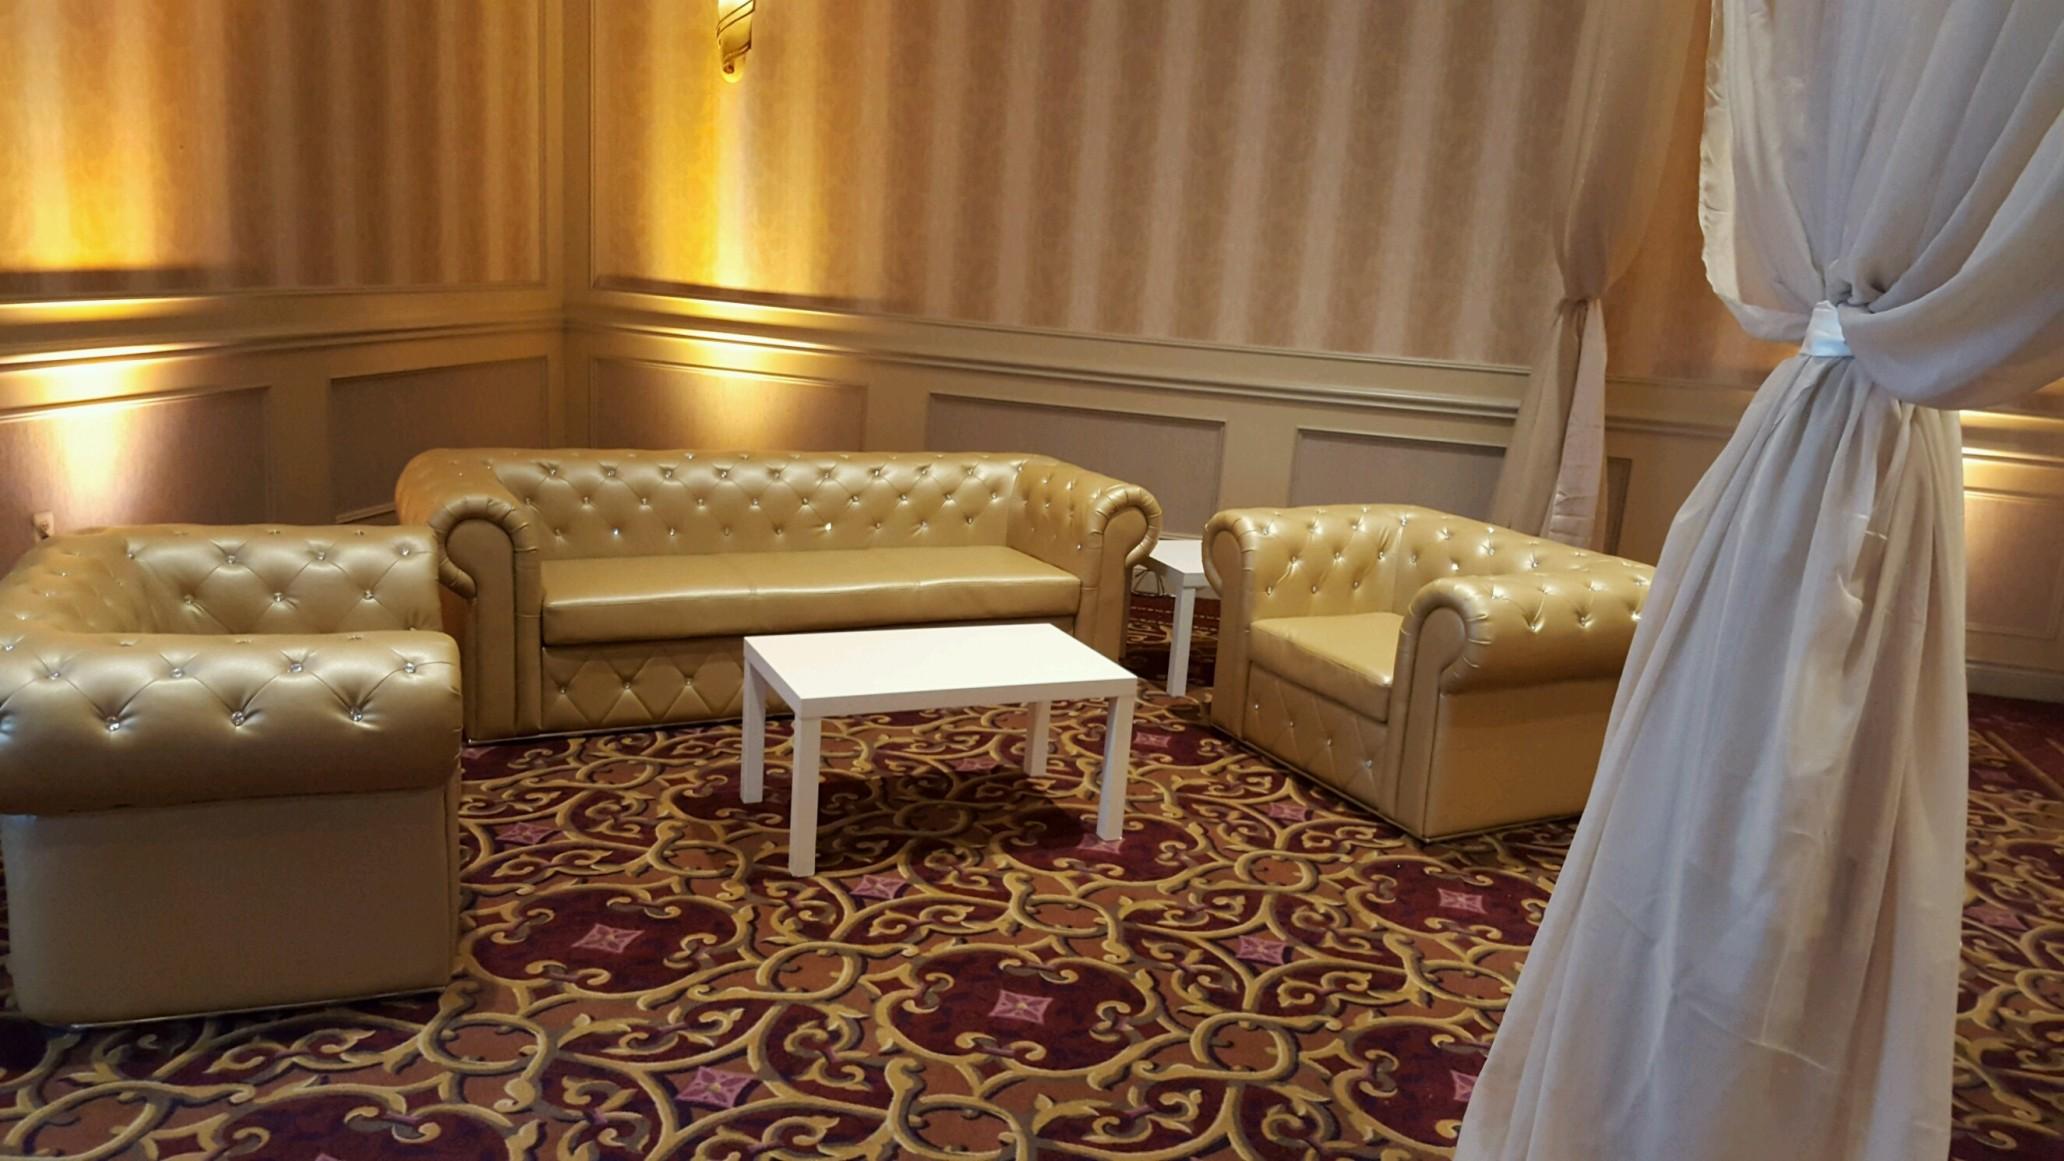 Beau Gold Leather Furniture